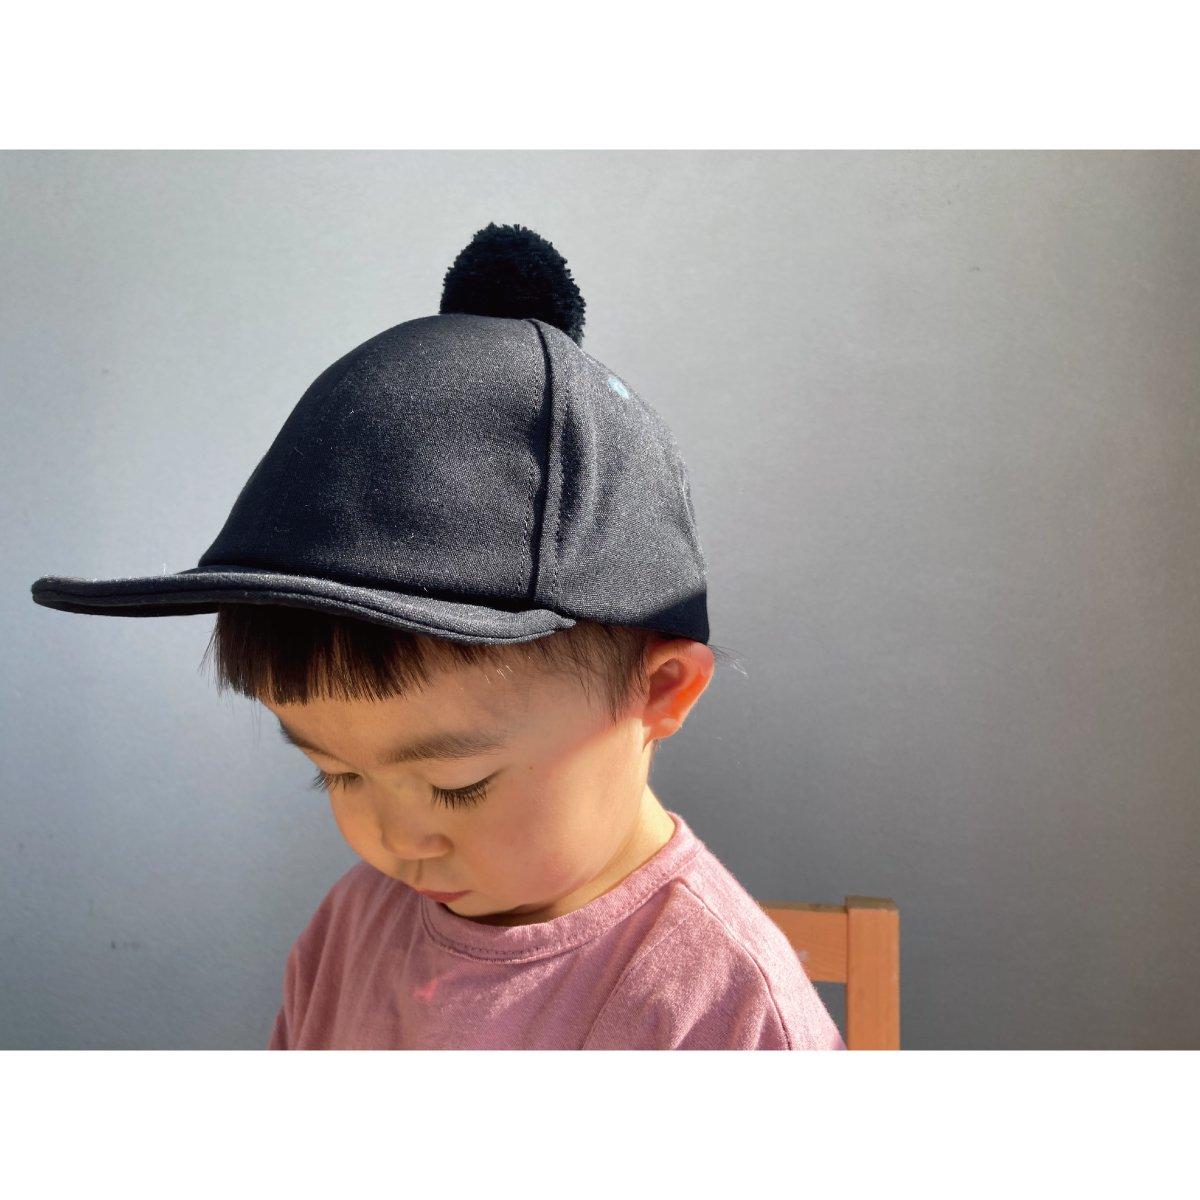 【KIDS】Dull Pon Cap 詳細画像31